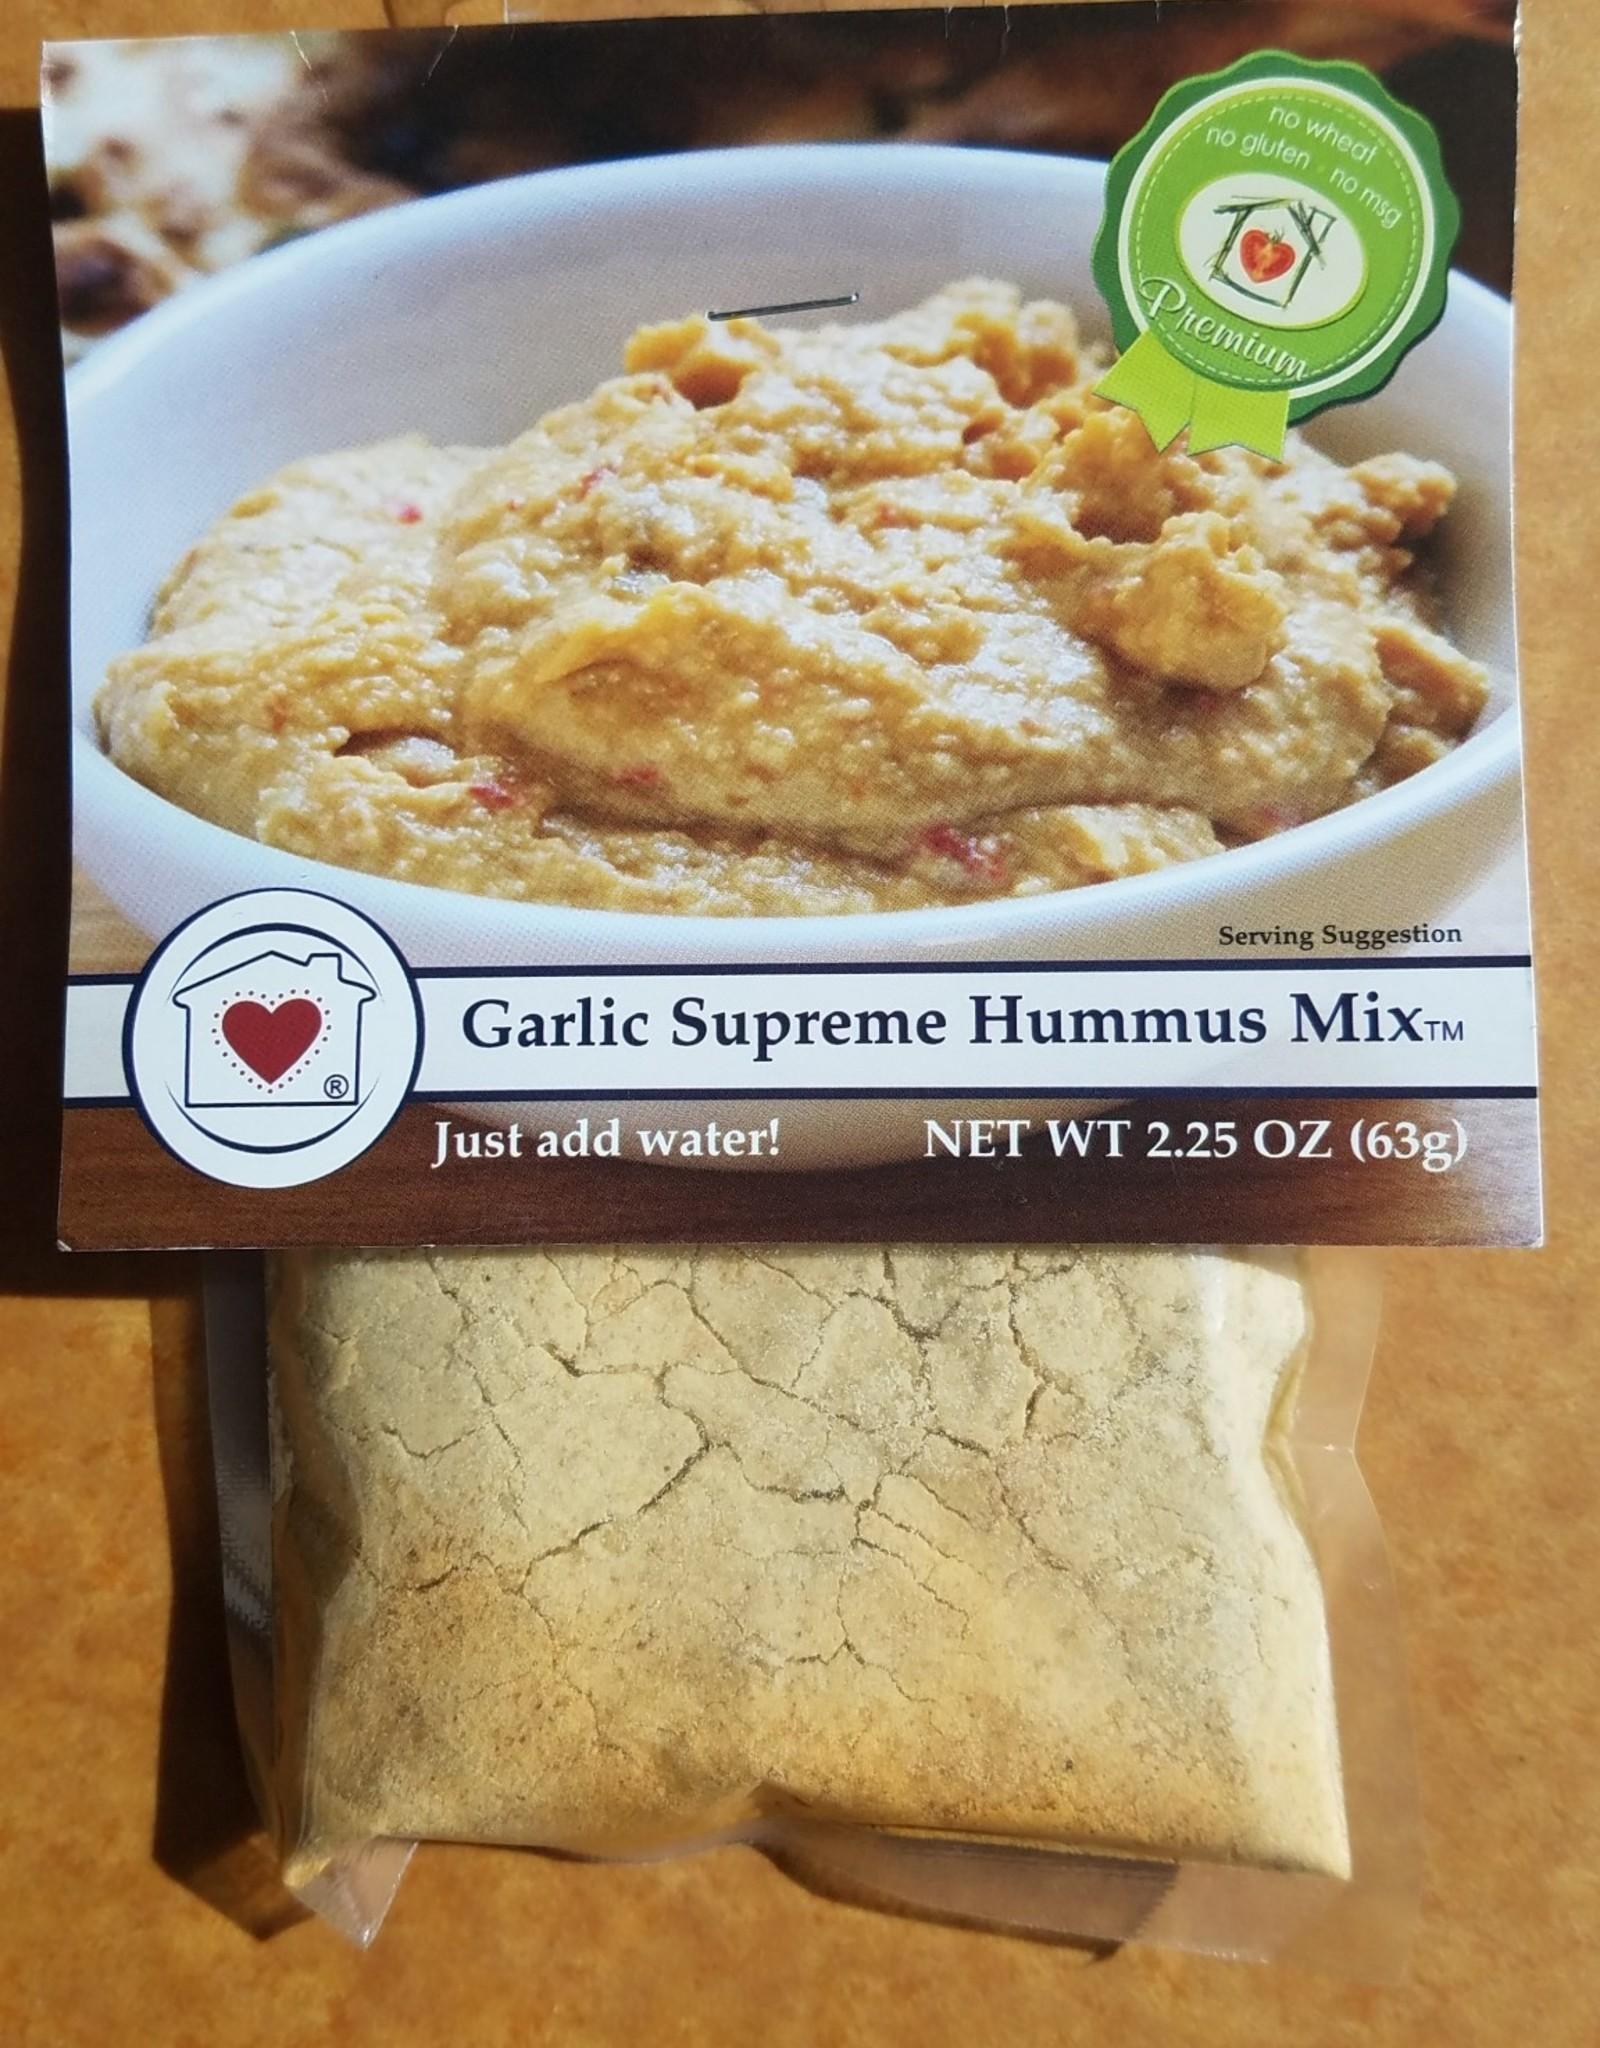 Country Home Creations Hummus Mix, Garlic Supreme